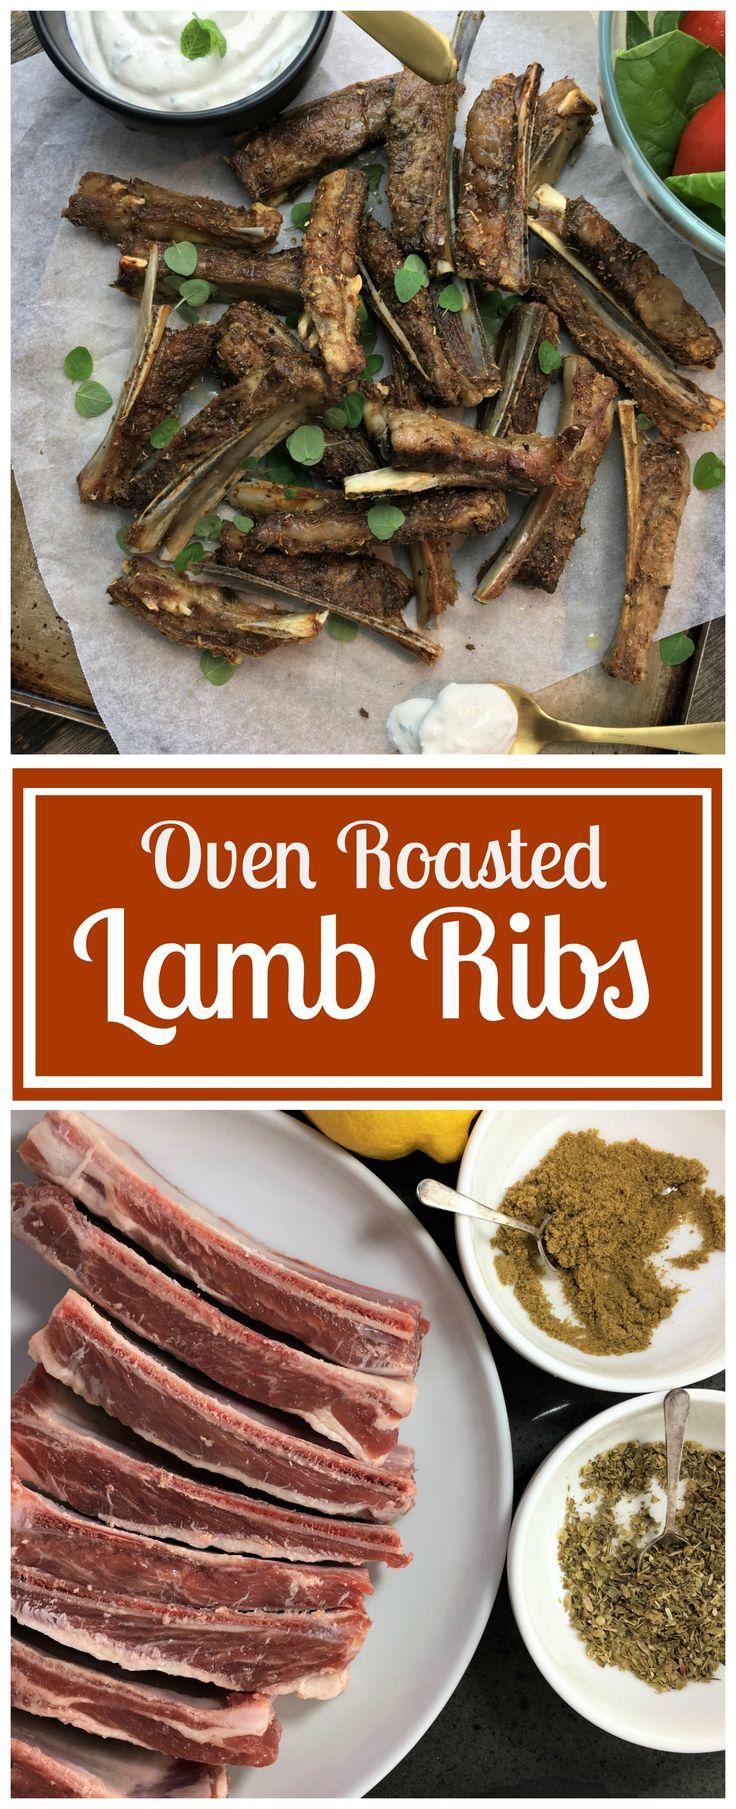 Oven roasted lamb ribs with yoghurt mint & garlic sauce. Easy oven baked lamb, so moist & tender.